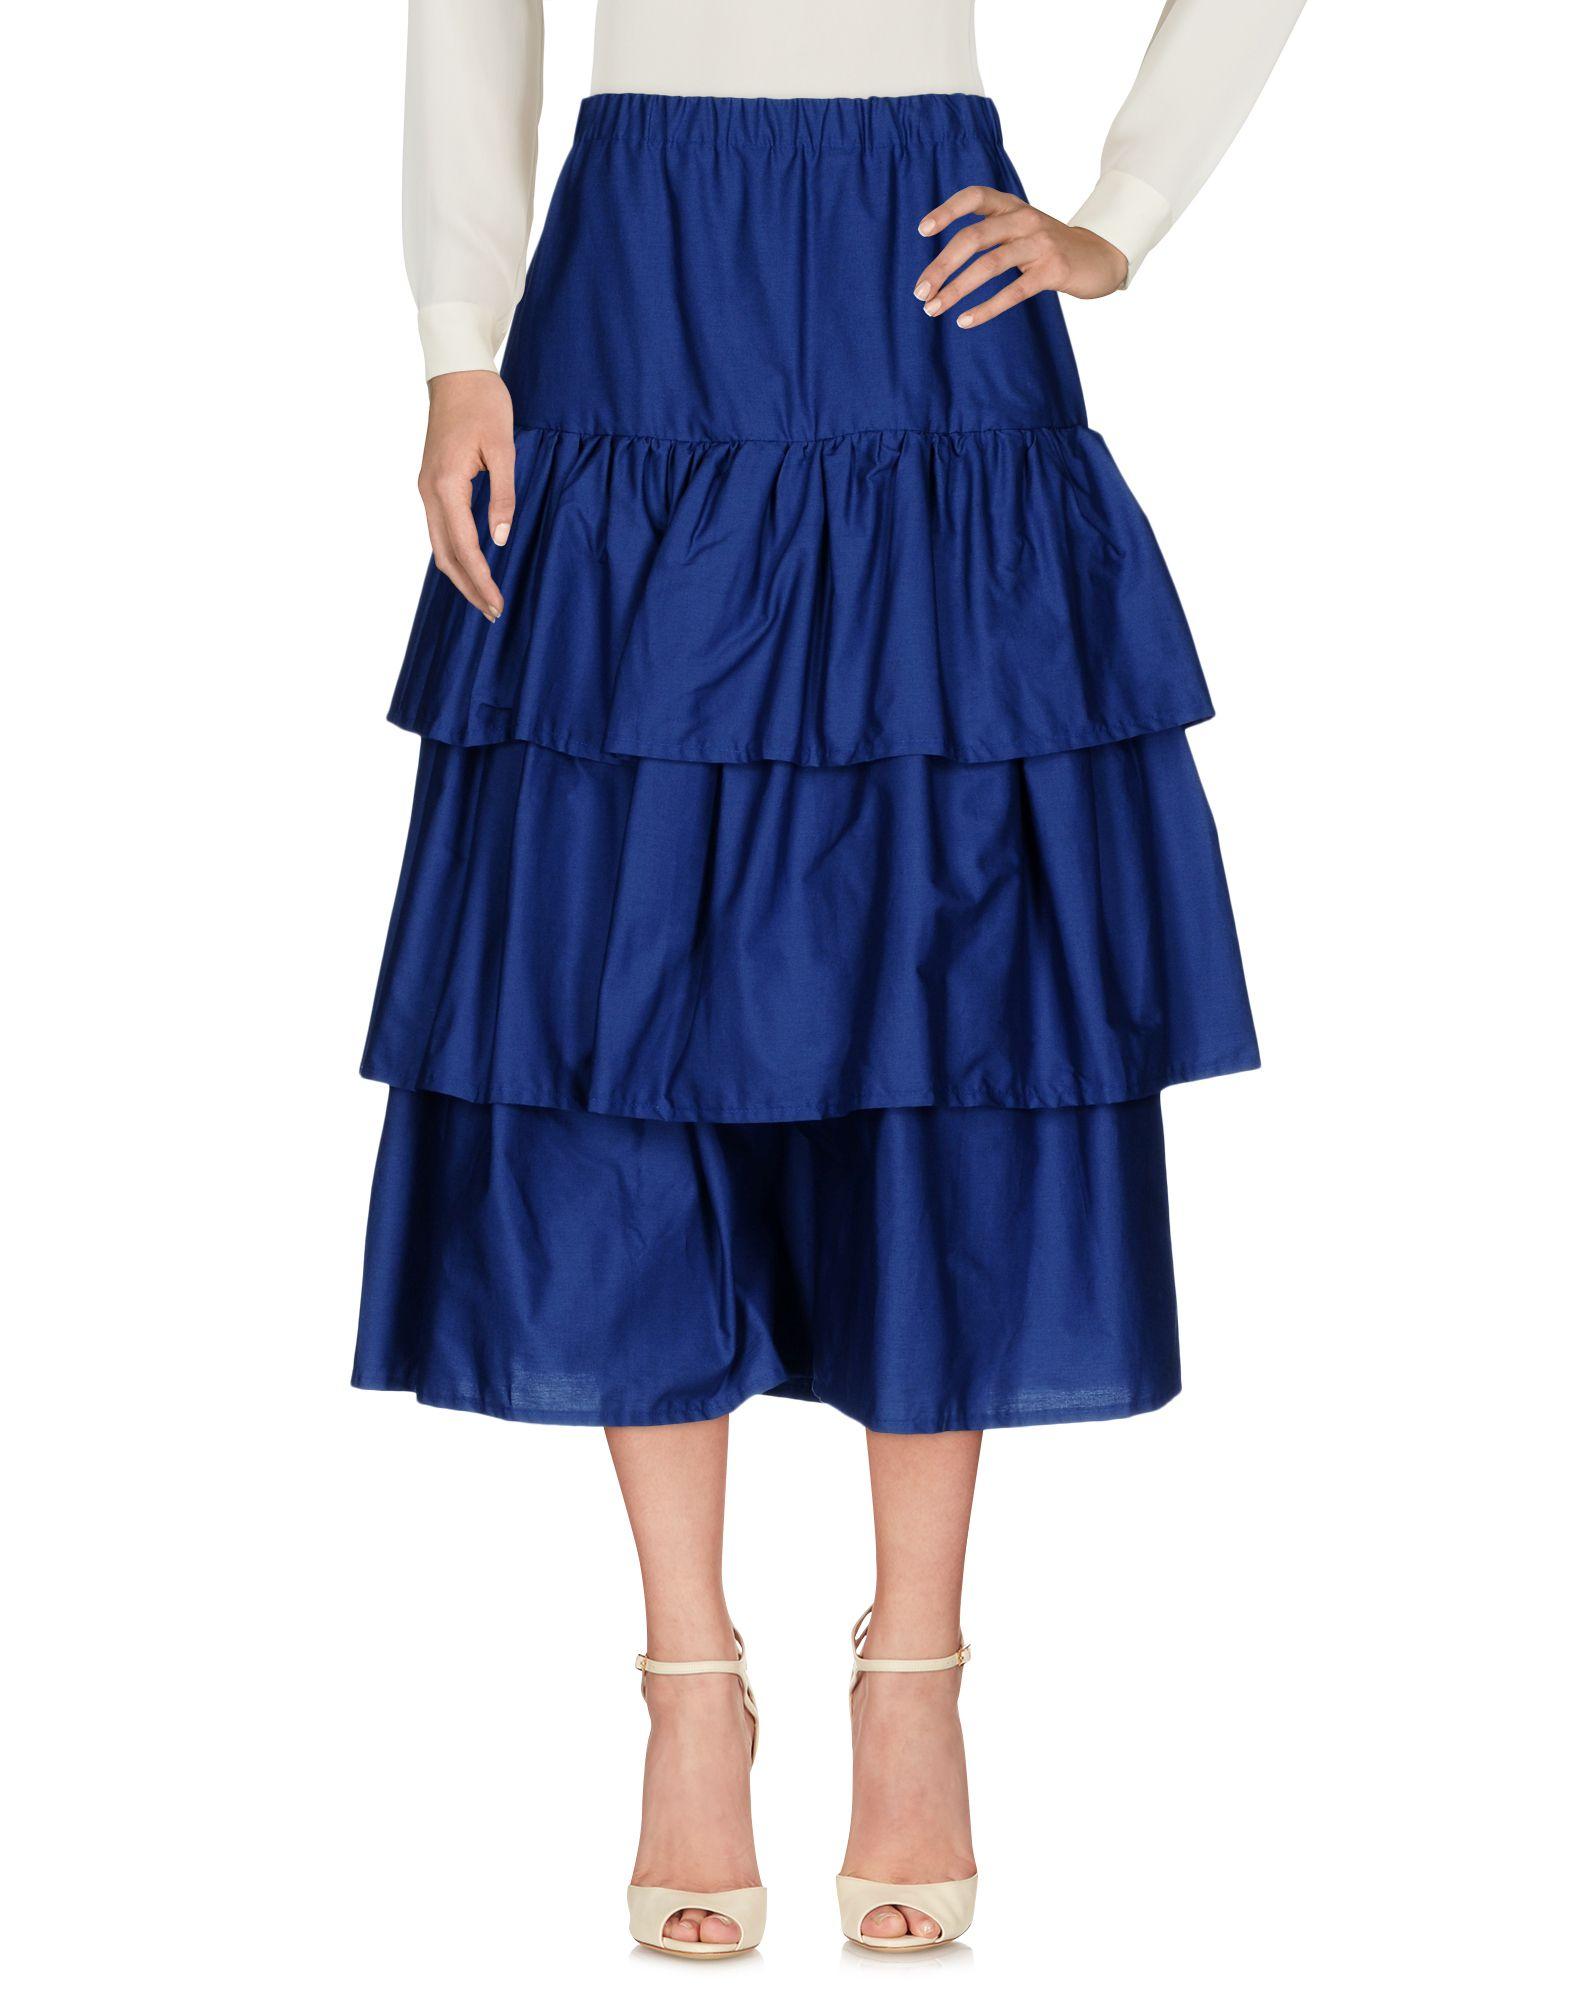 ROSE' A POIS Юбка длиной 3/4 debbie katz юбка длиной 3 4